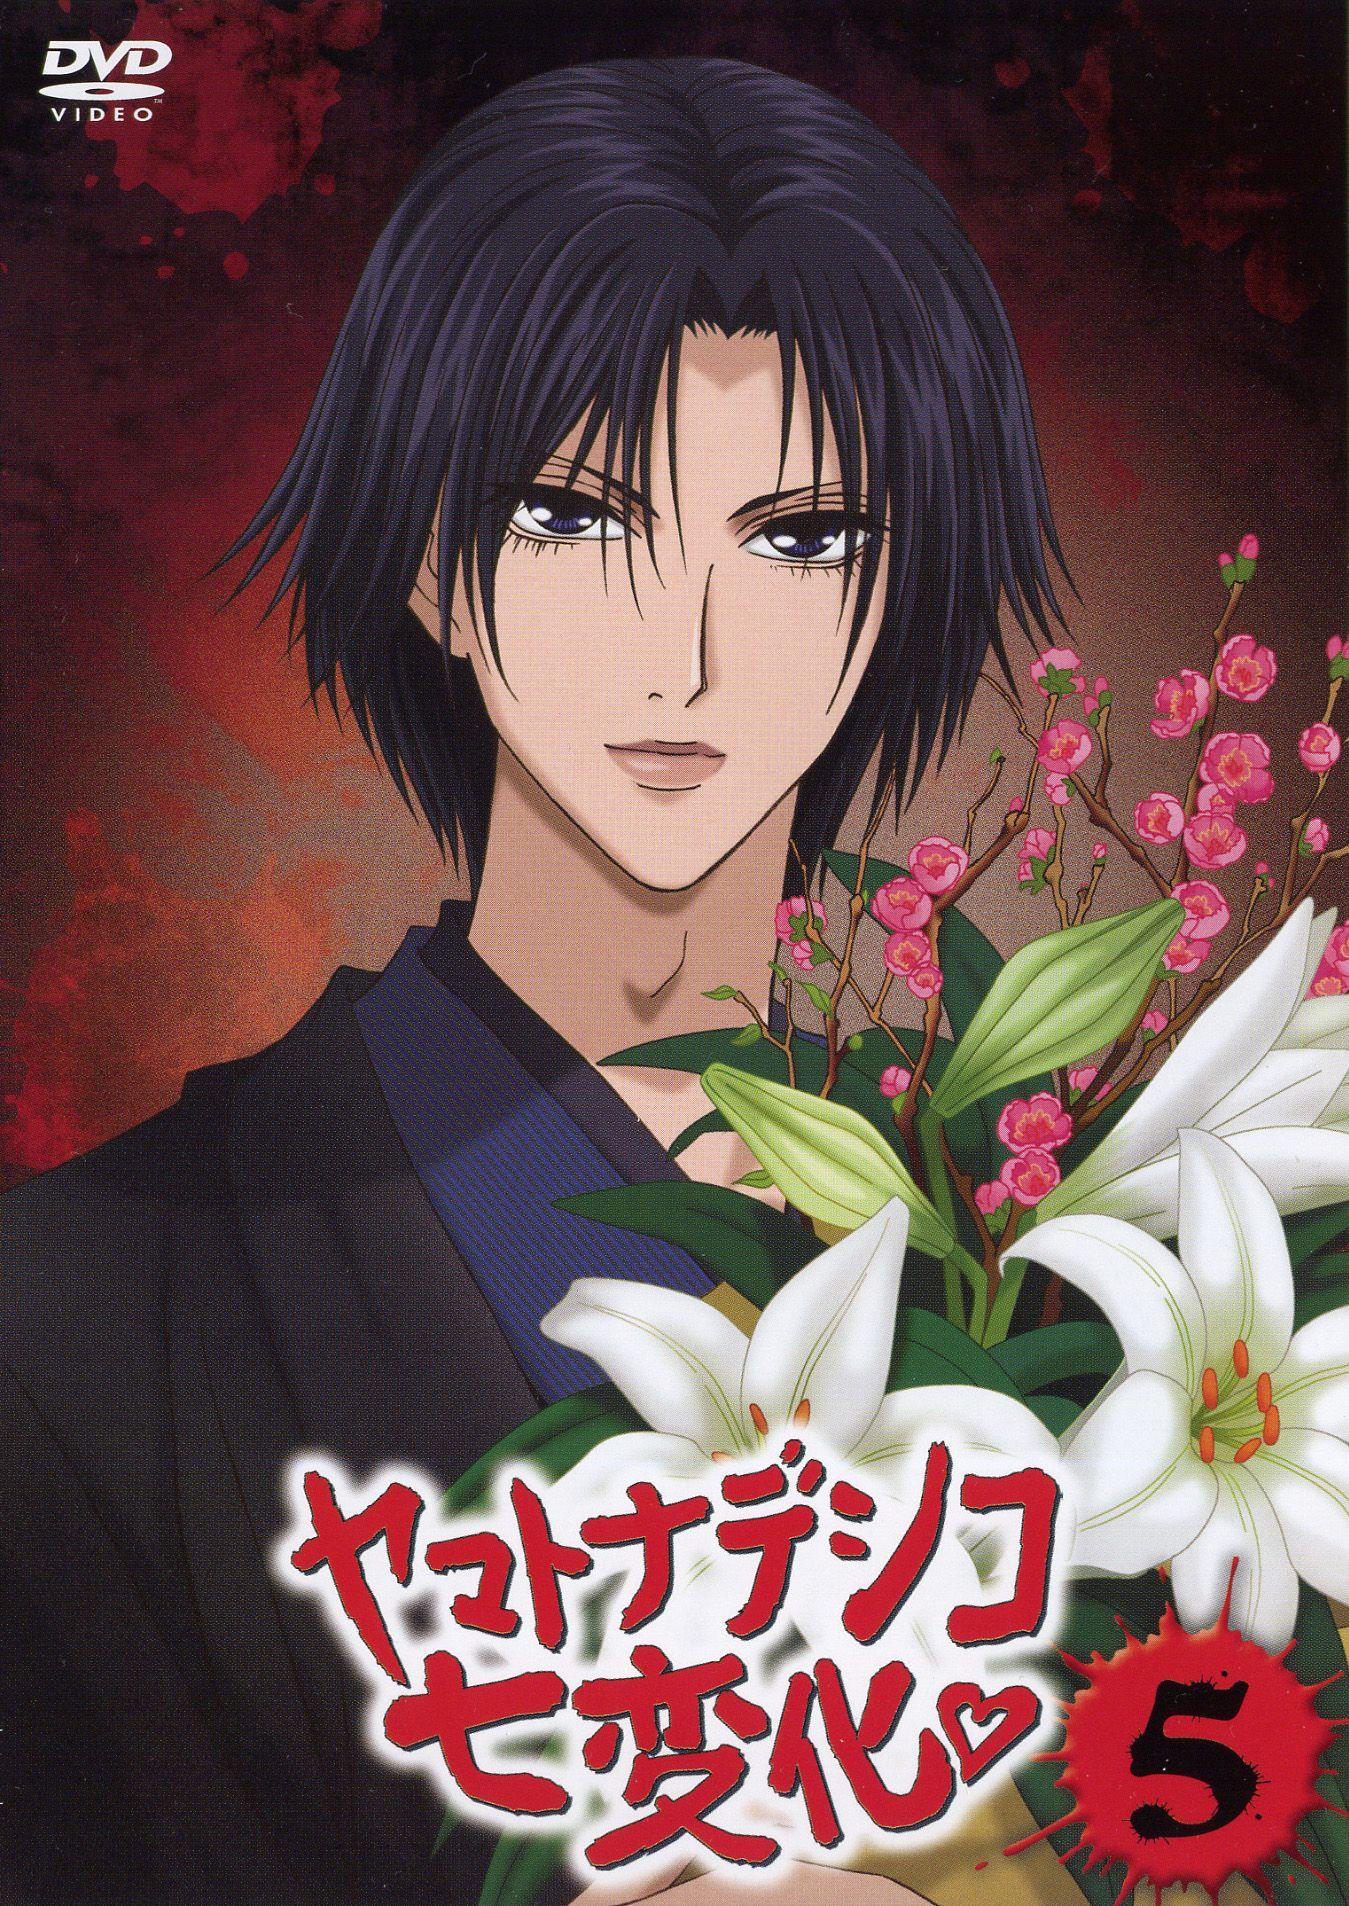 Takenaga Oda Wallflower anime, Anime, Yamato